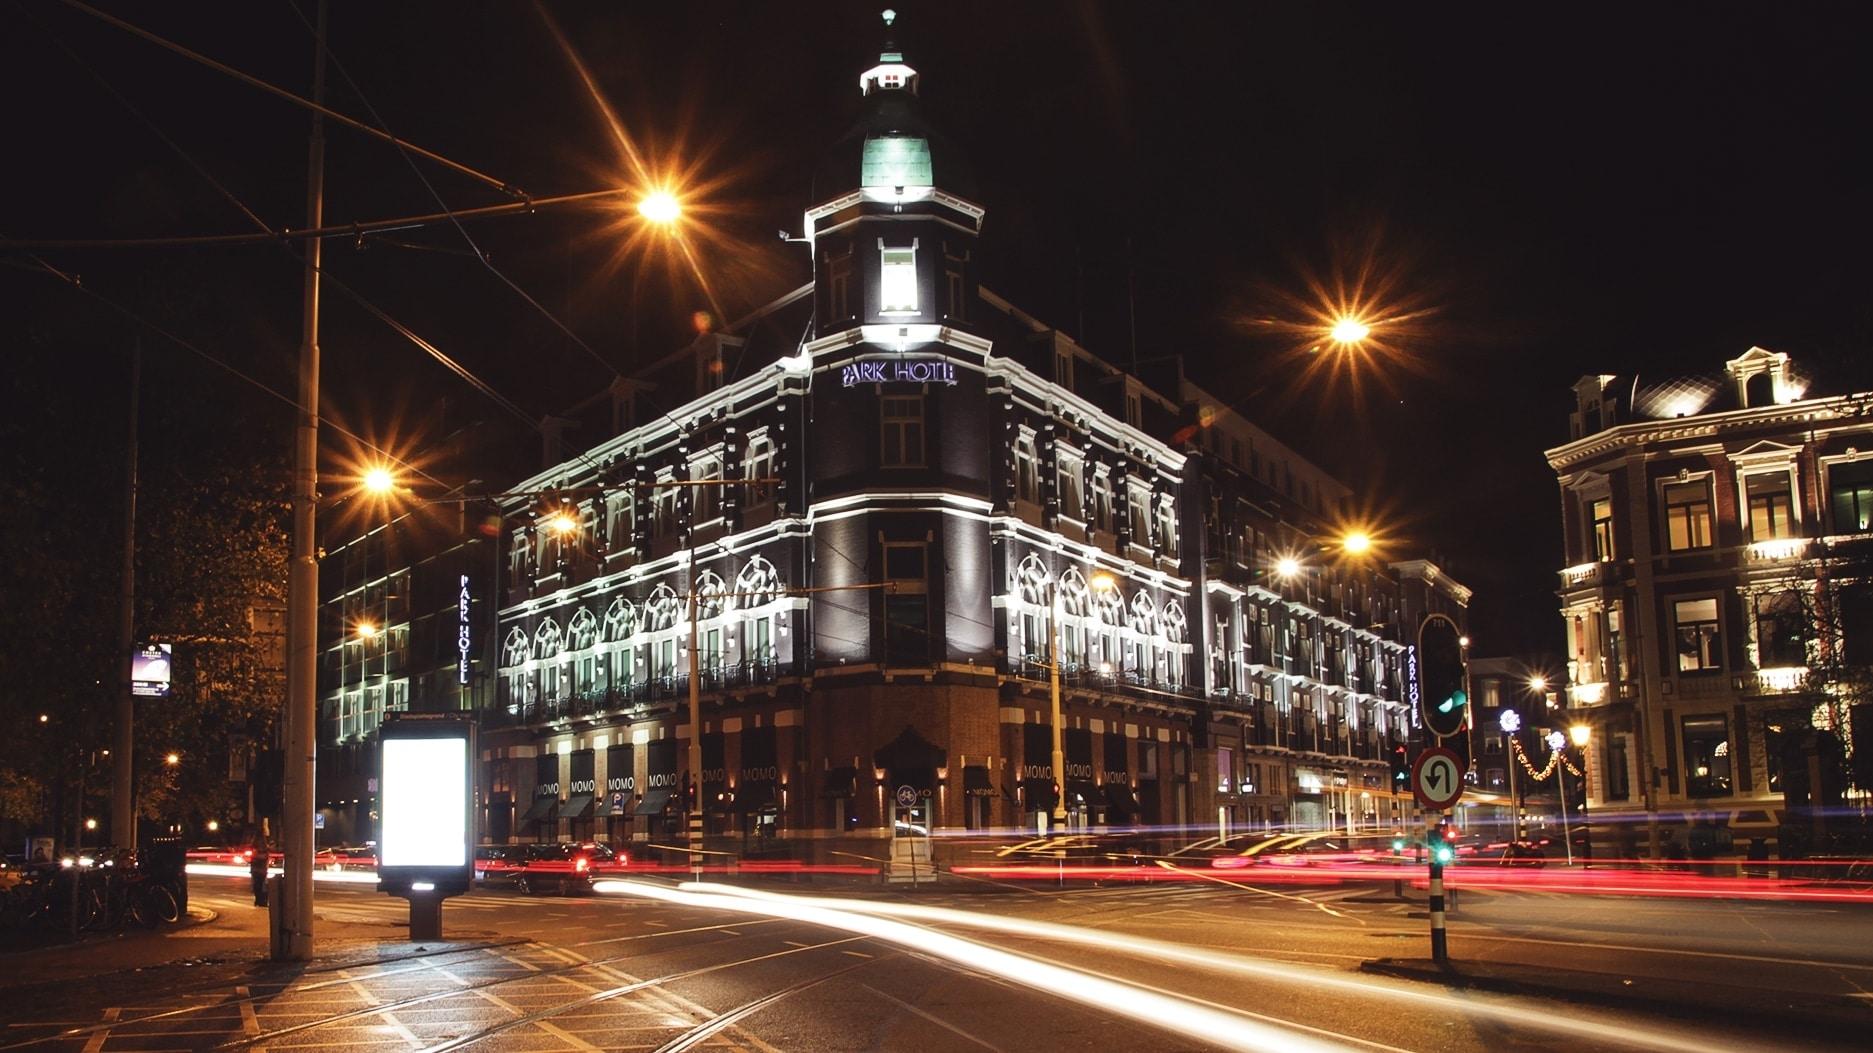 Night photography, take 1.